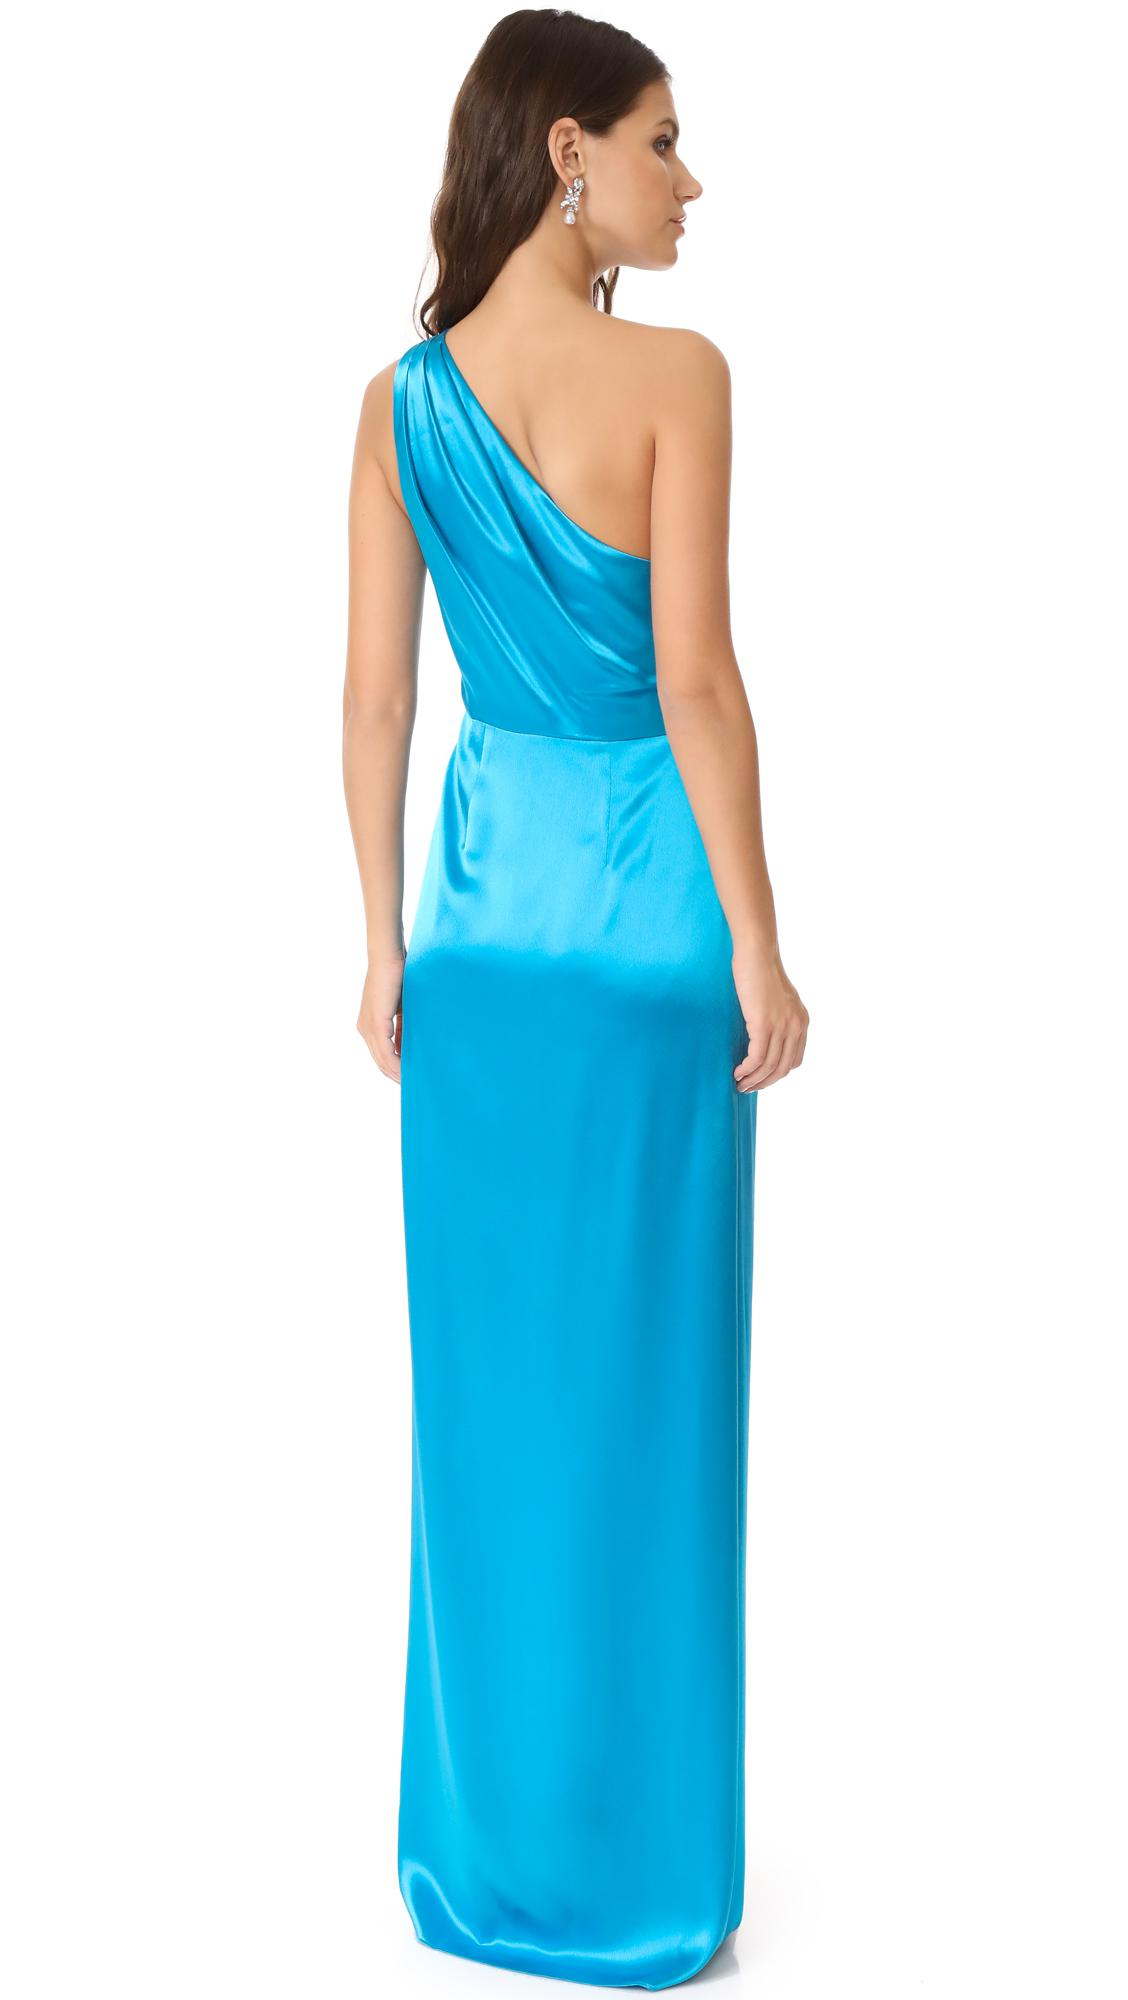 Lyst - Zac Posen Stacy Gown in Blue